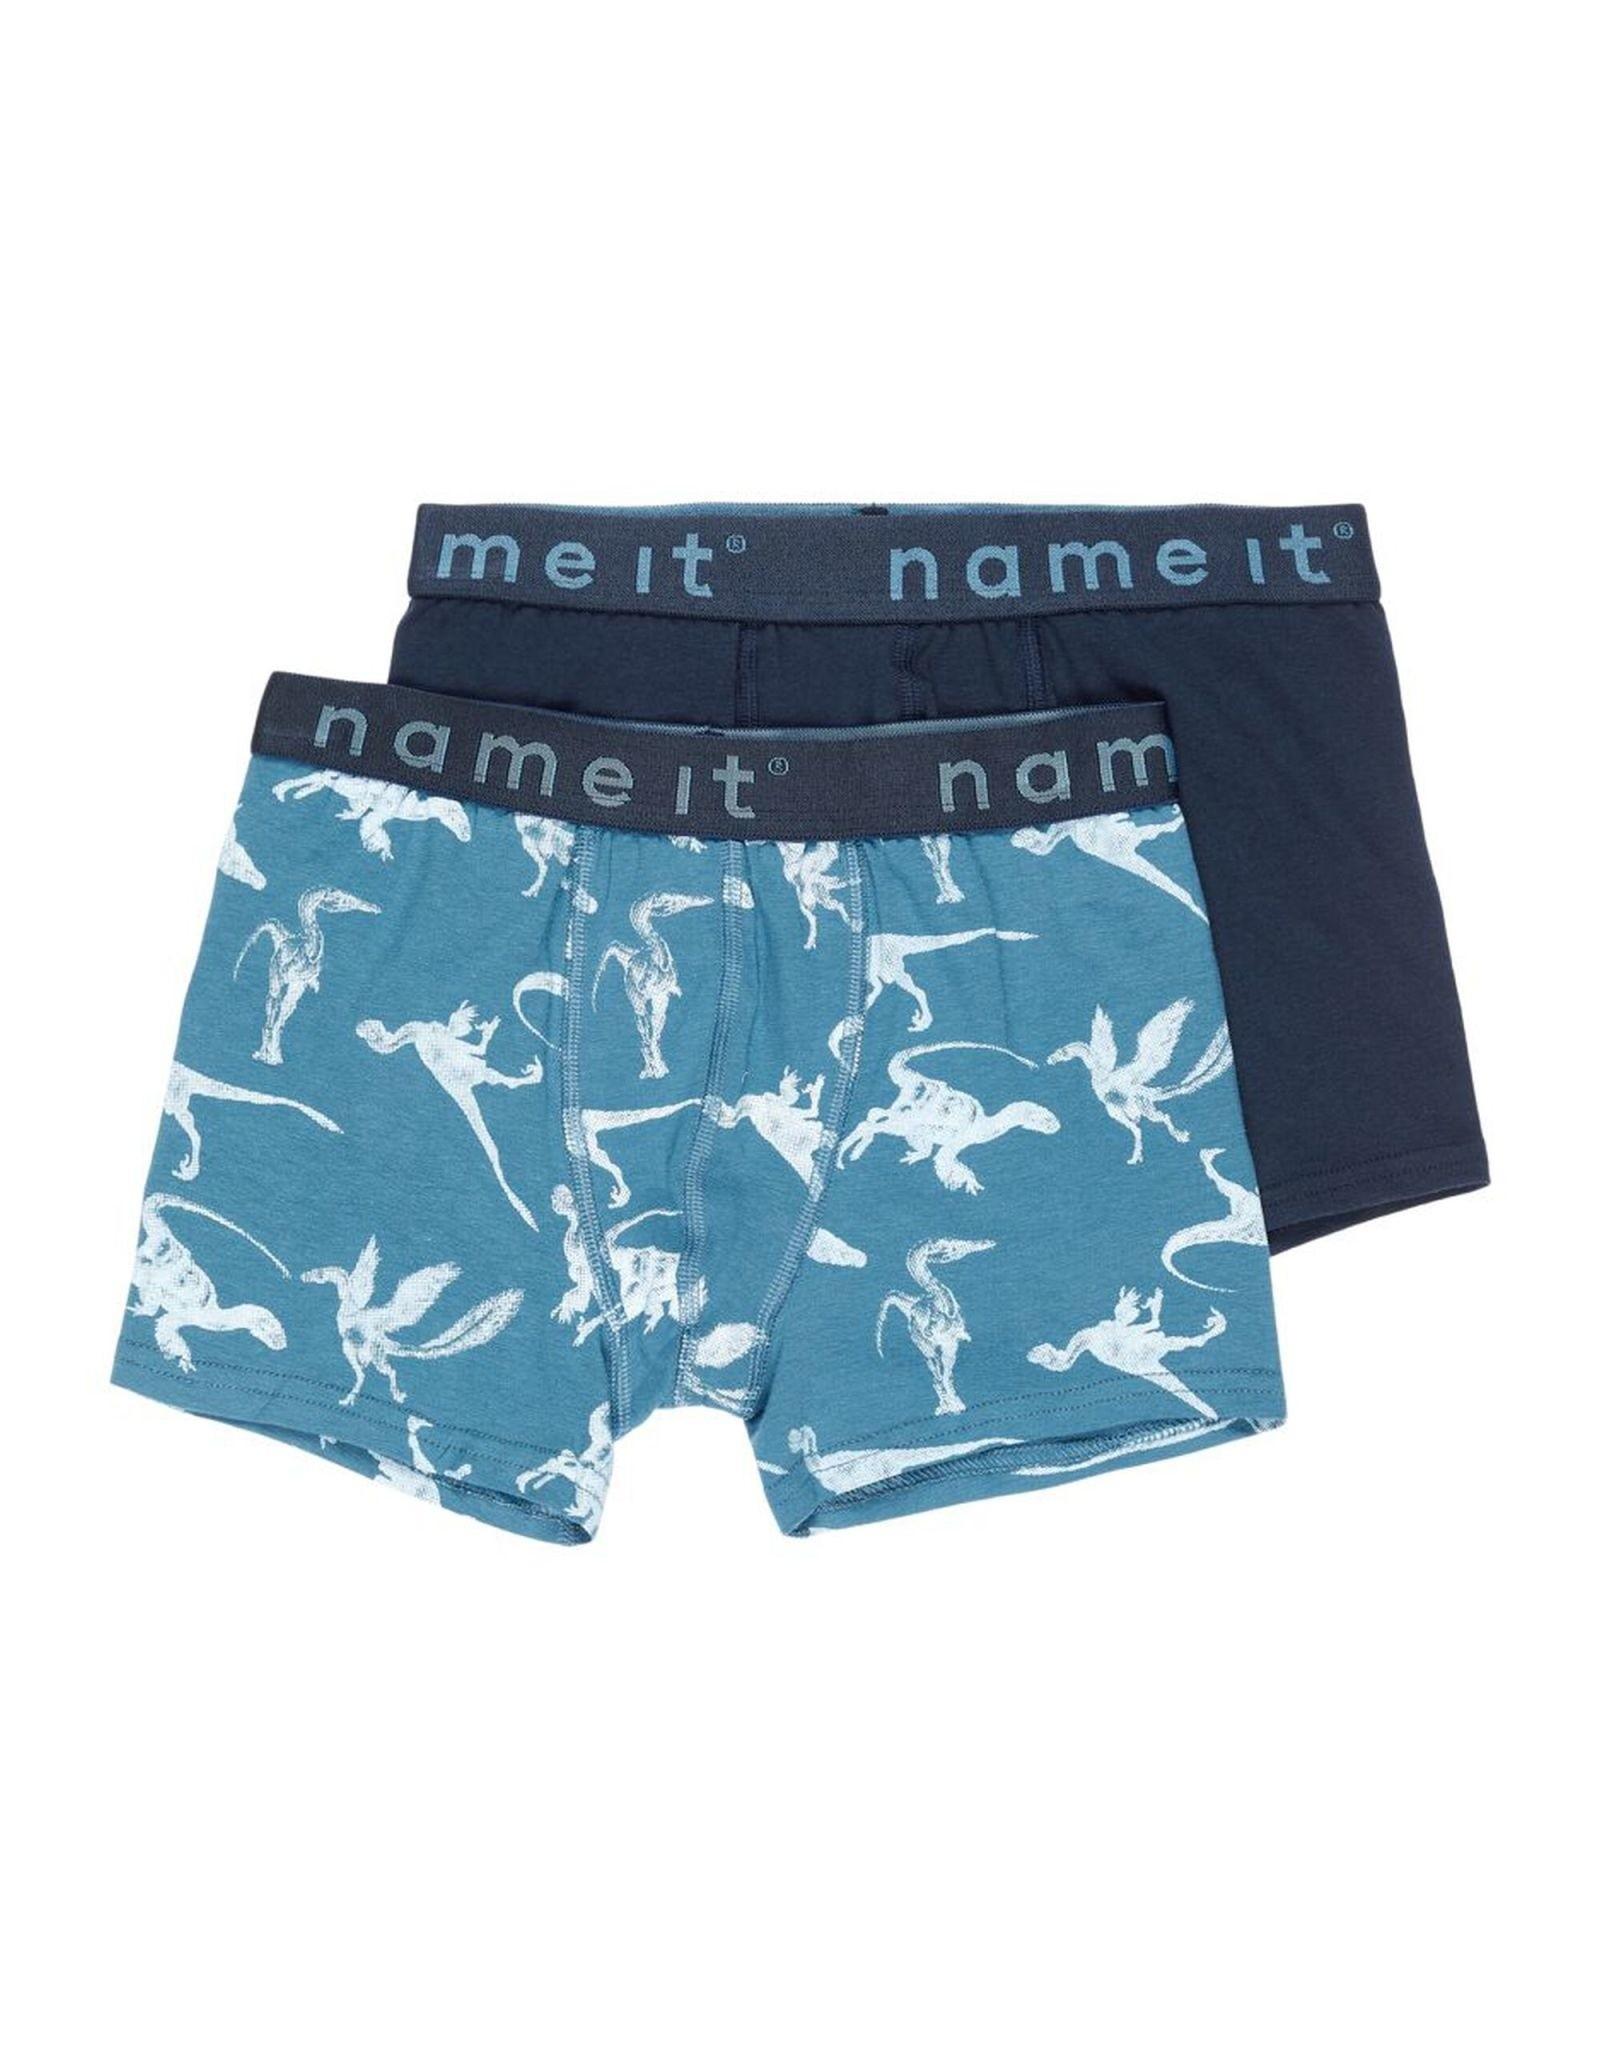 Name It 2-pack boxer short (1 effen en 1 dino print)